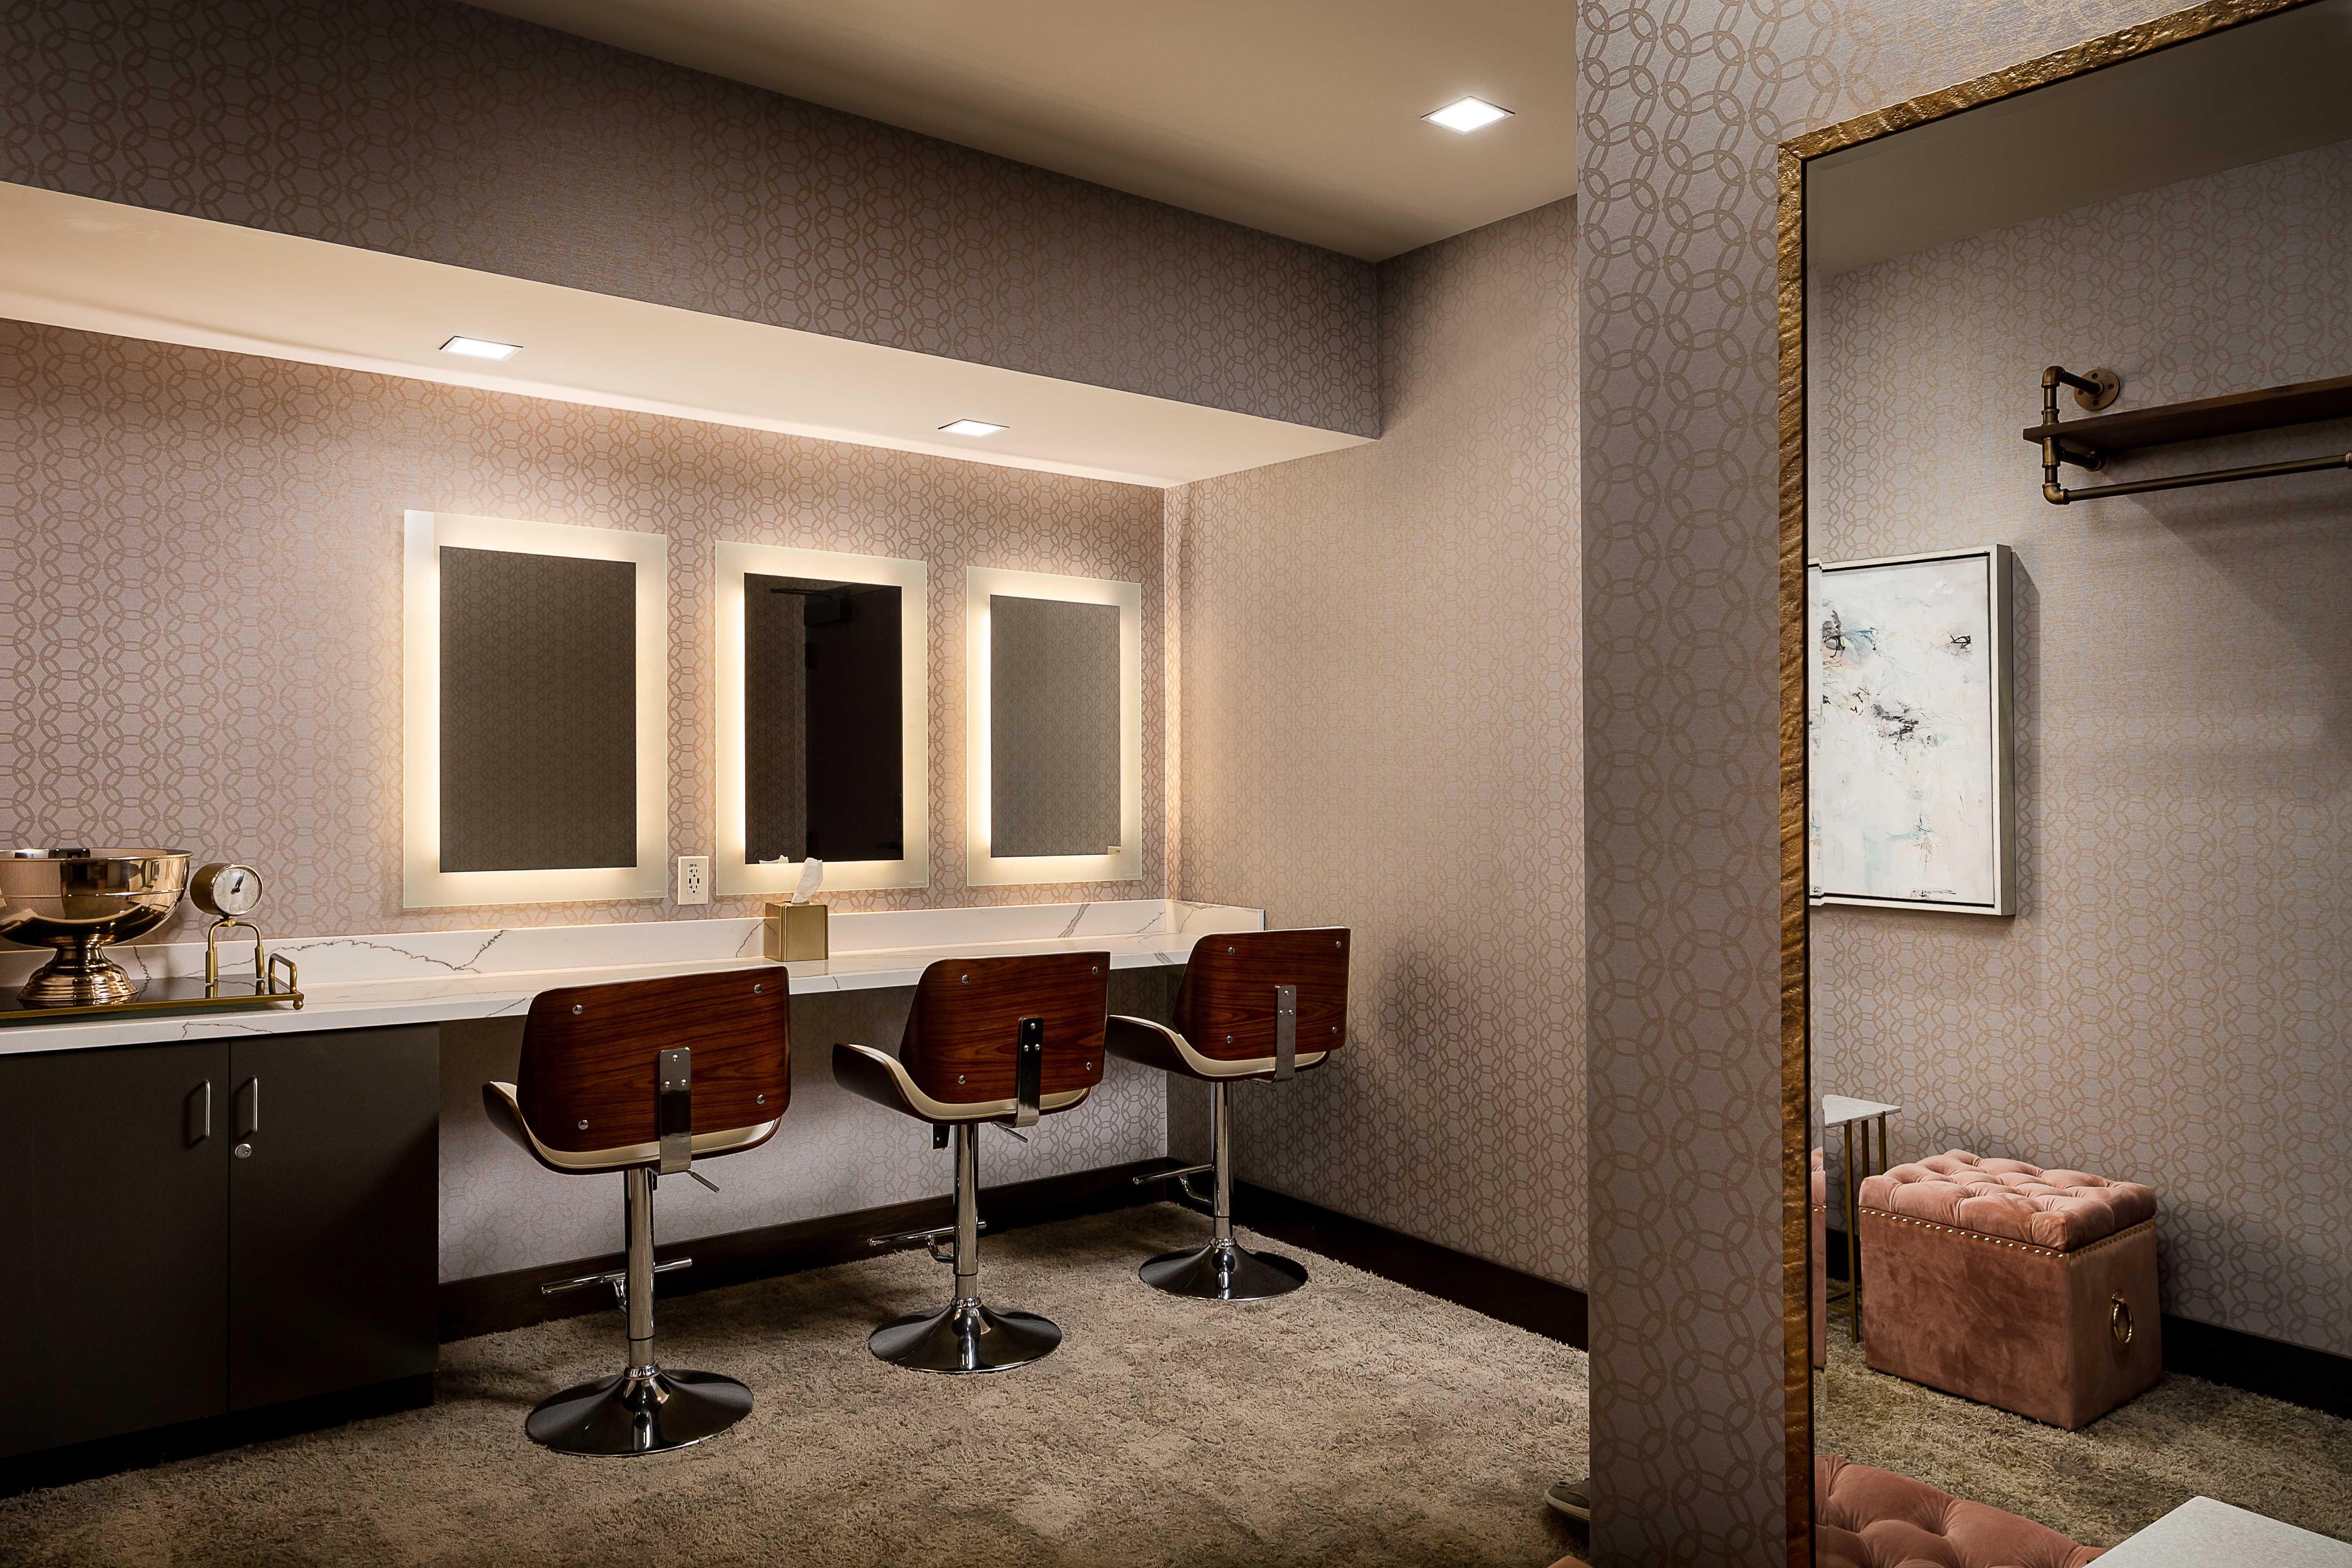 savor-river-house-dressing-room